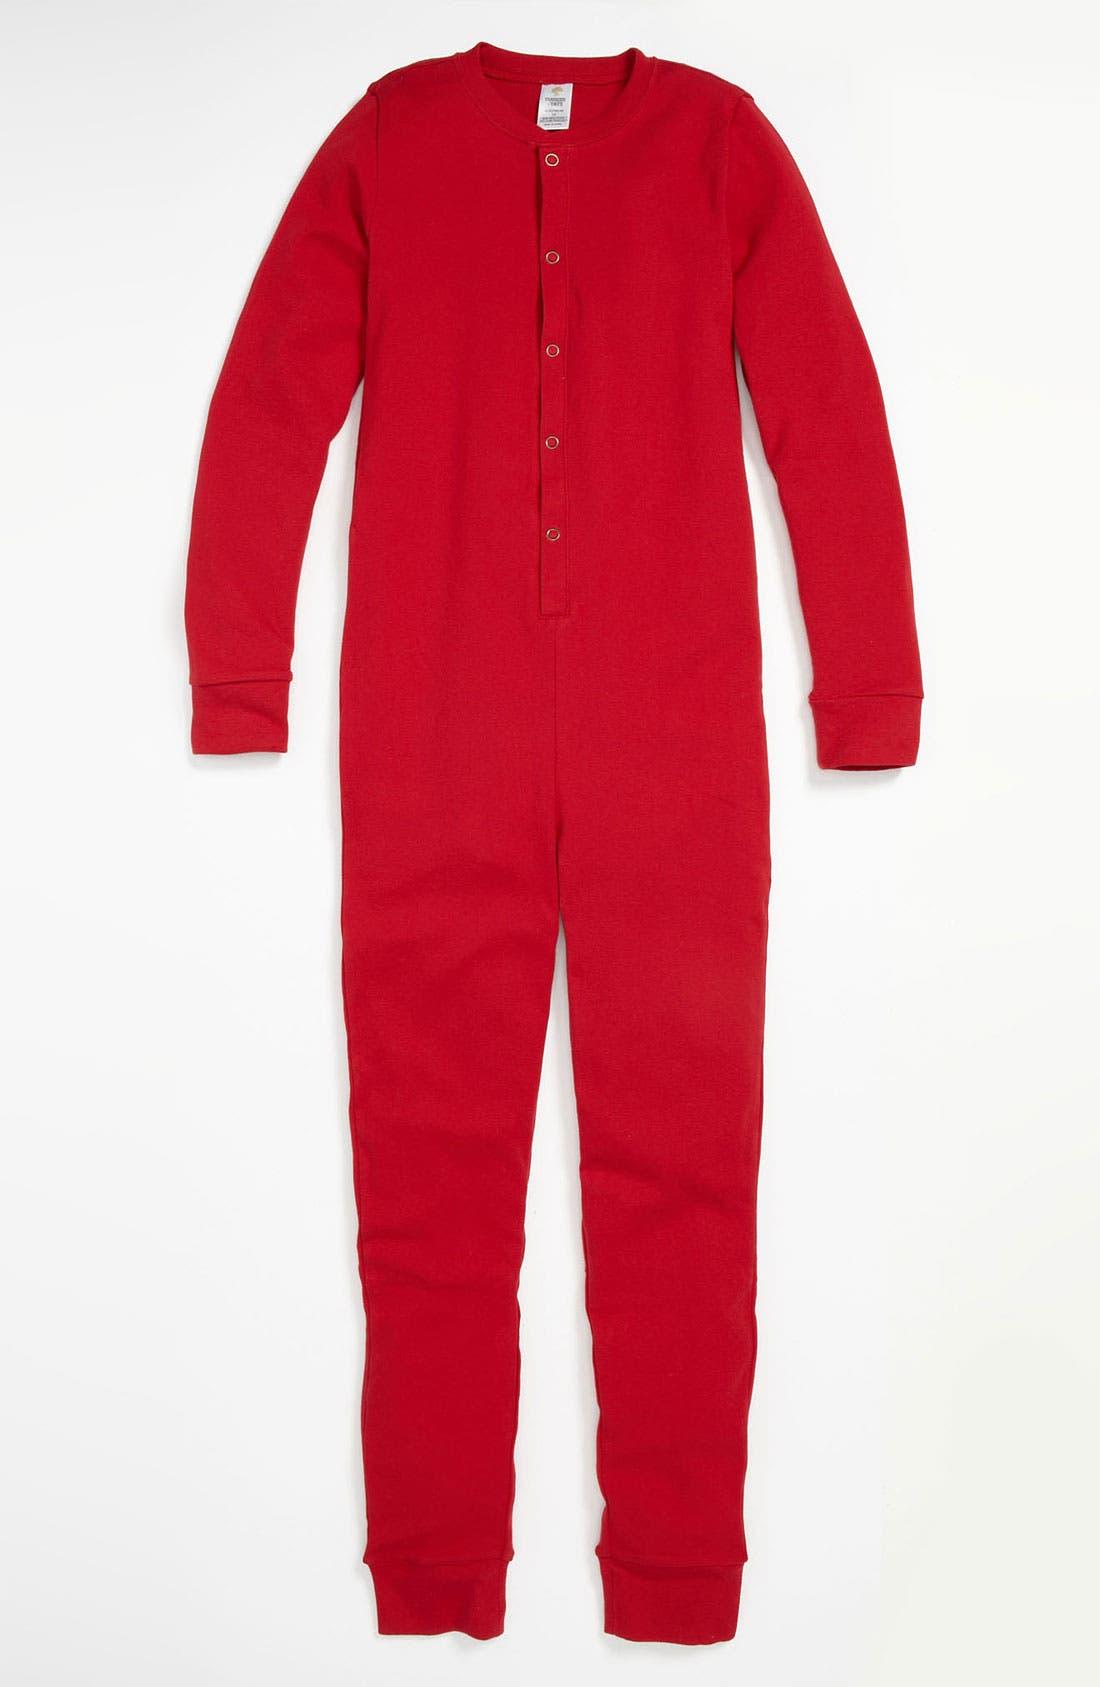 Alternate Image 1 Selected - Tucker + Tate 'Fireside' Fitted Pajamas (Little Boys & Big Boys)